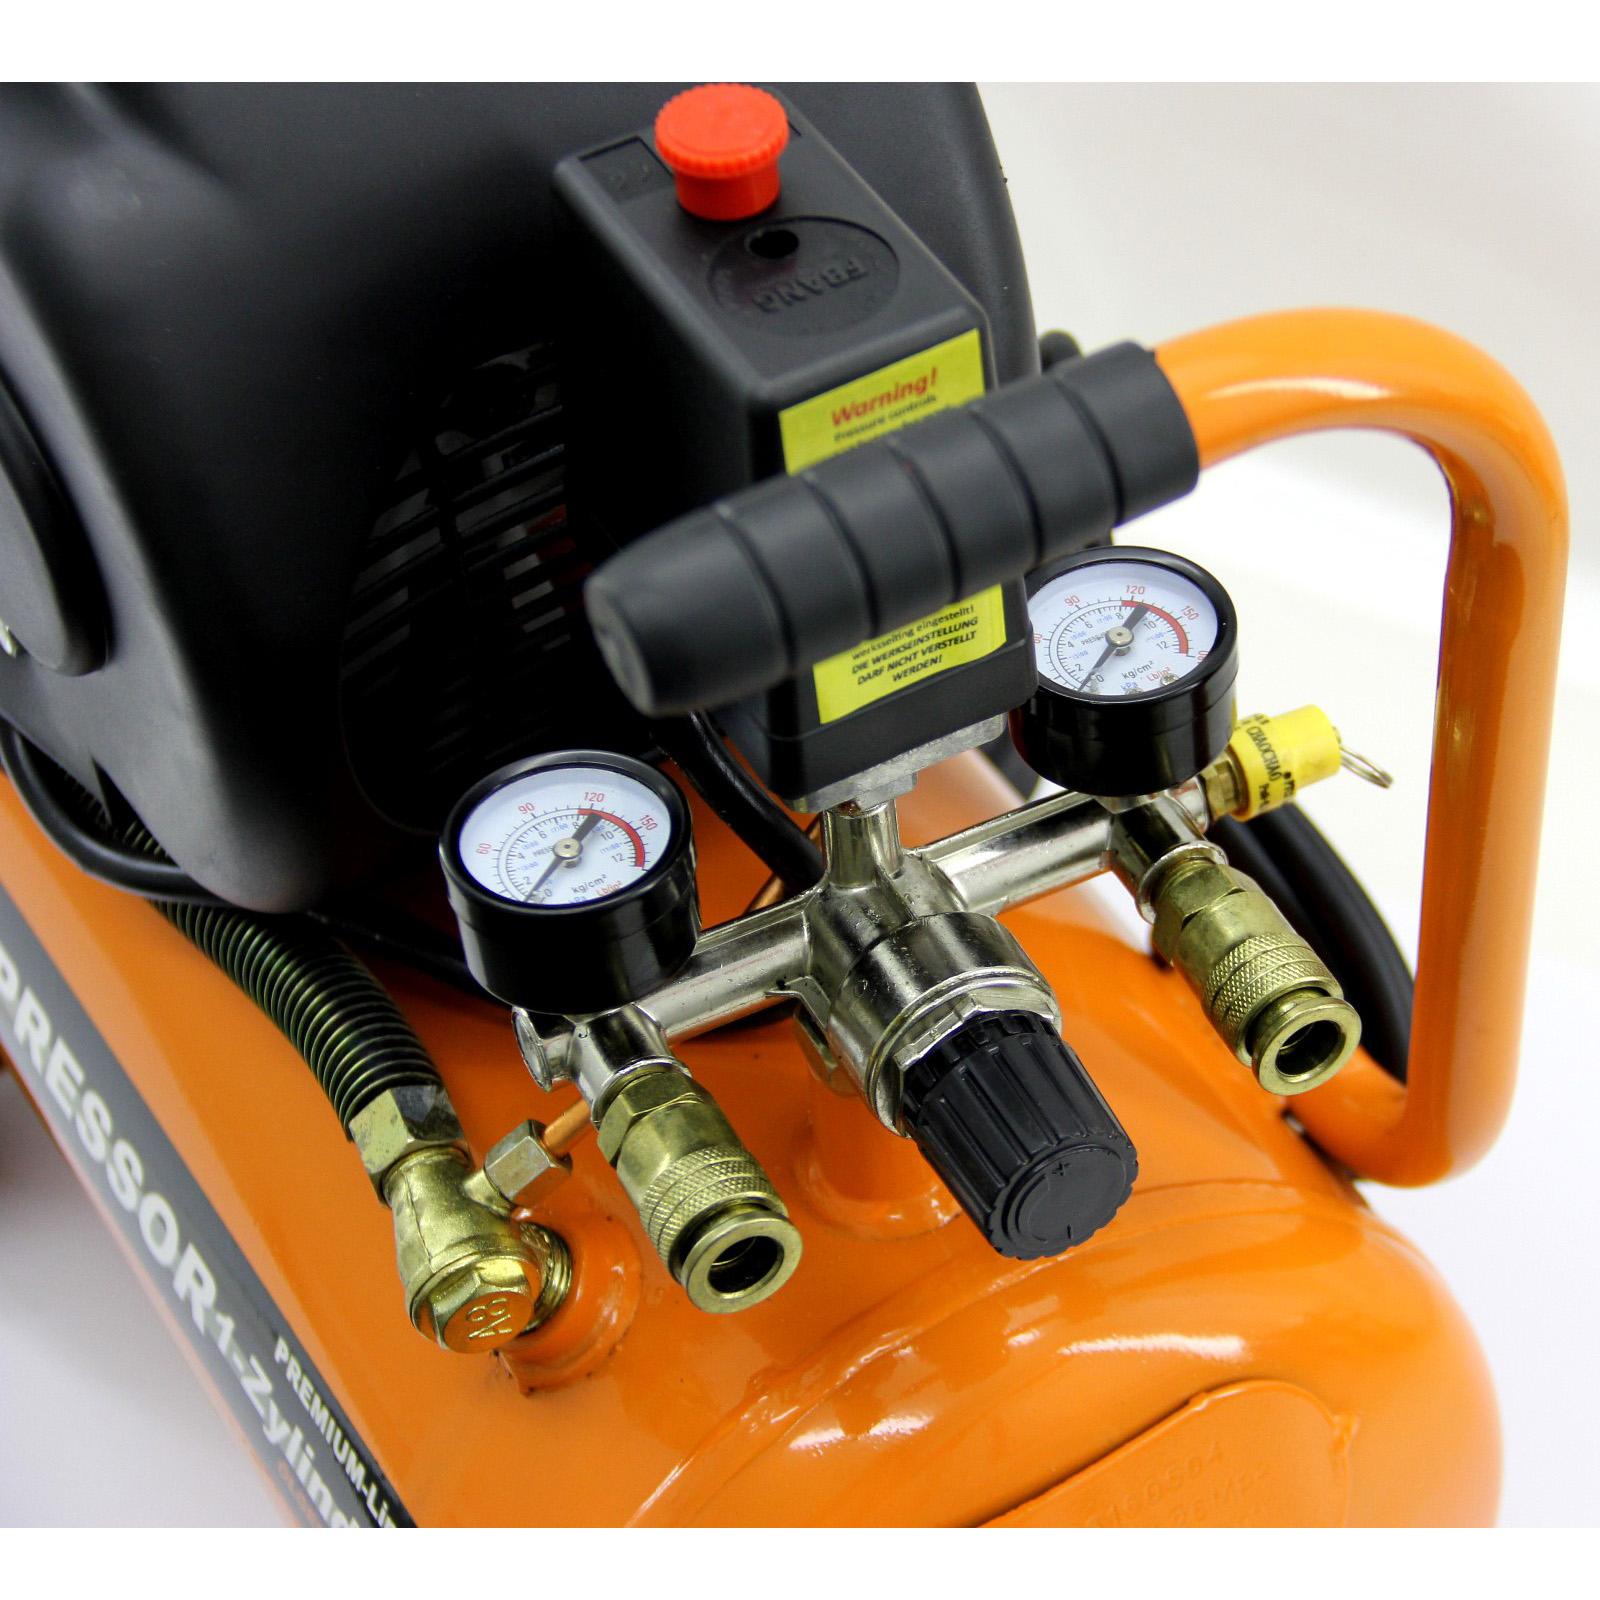 druckluft kompressor luftkompressor 8 bar 1500watt 24l. Black Bedroom Furniture Sets. Home Design Ideas